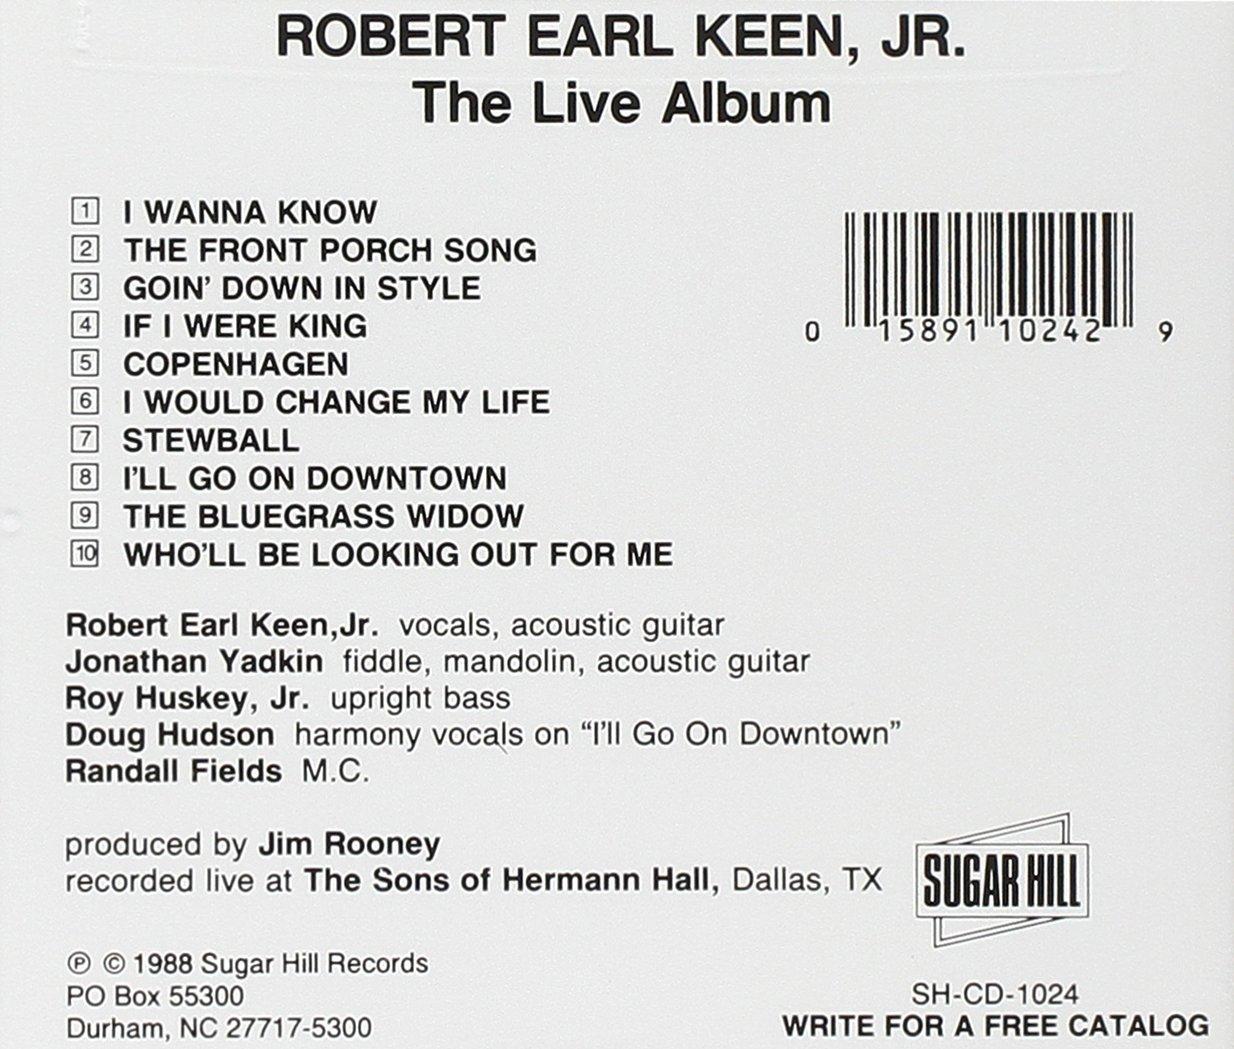 Robert Earl Keen Jr. - The Live Album - Amazon.com Music